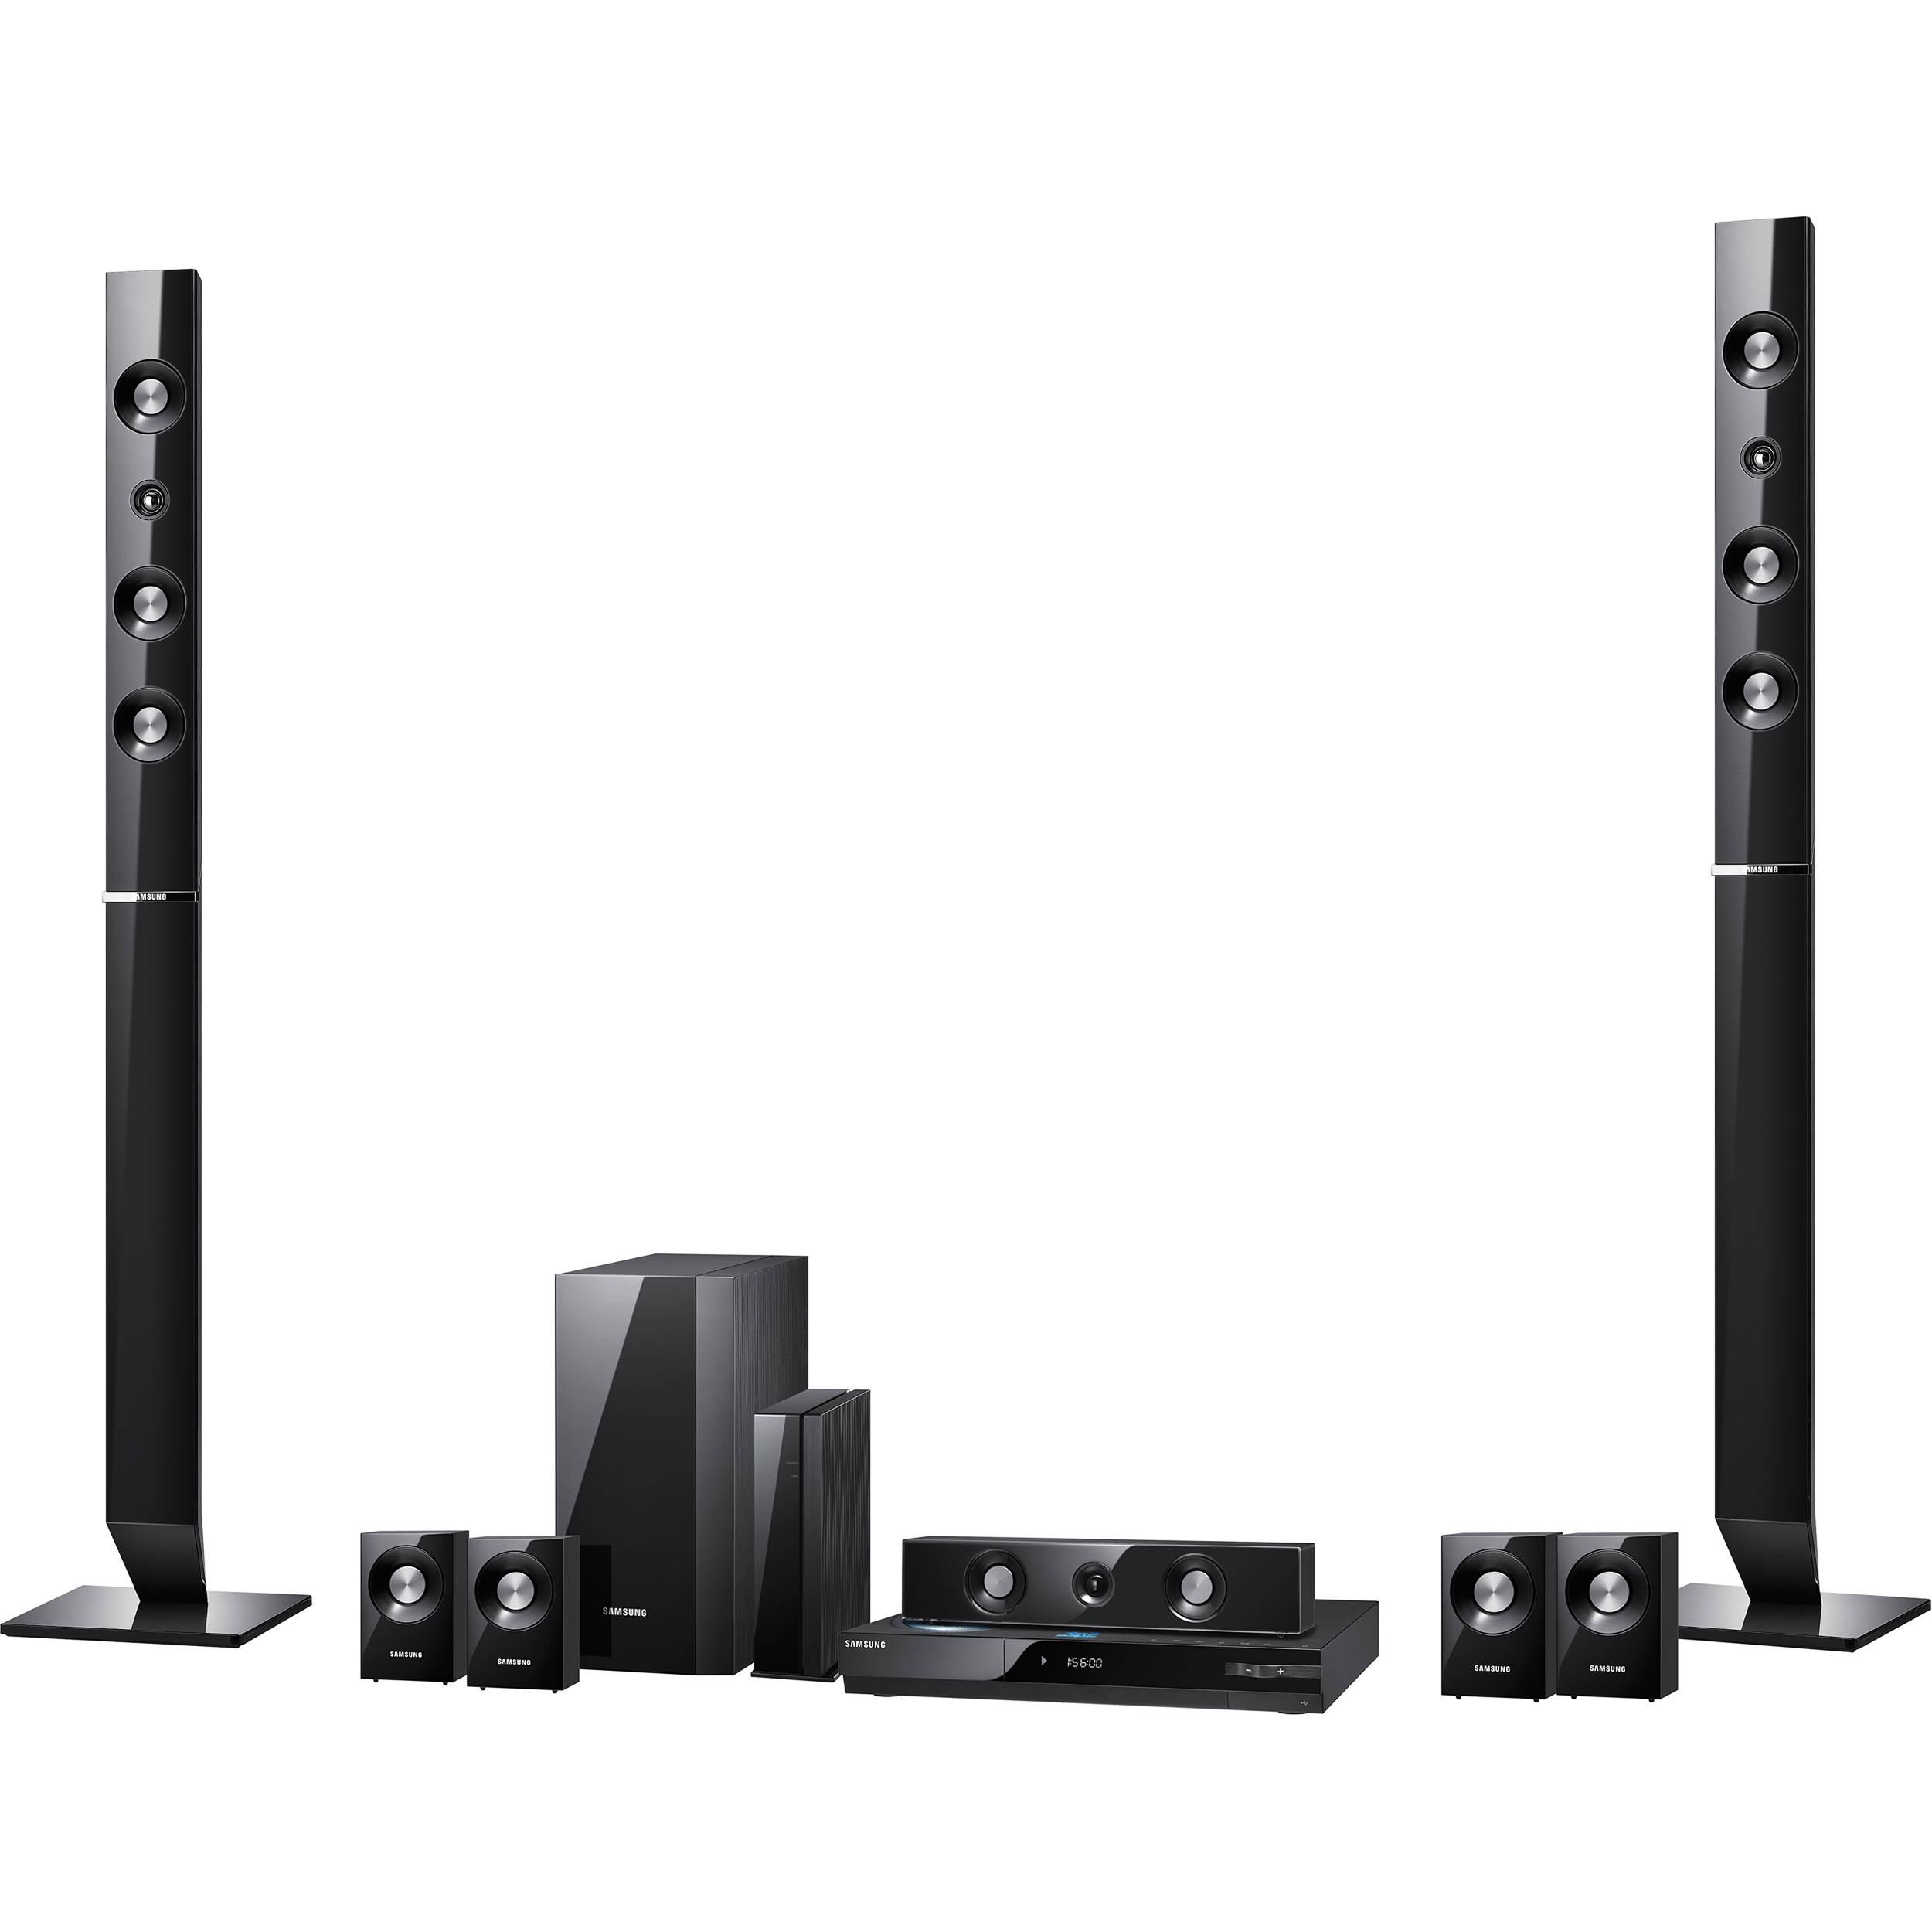 Samsung Ht C6730w Blu Ray Home Theater System Ht C6730w B H